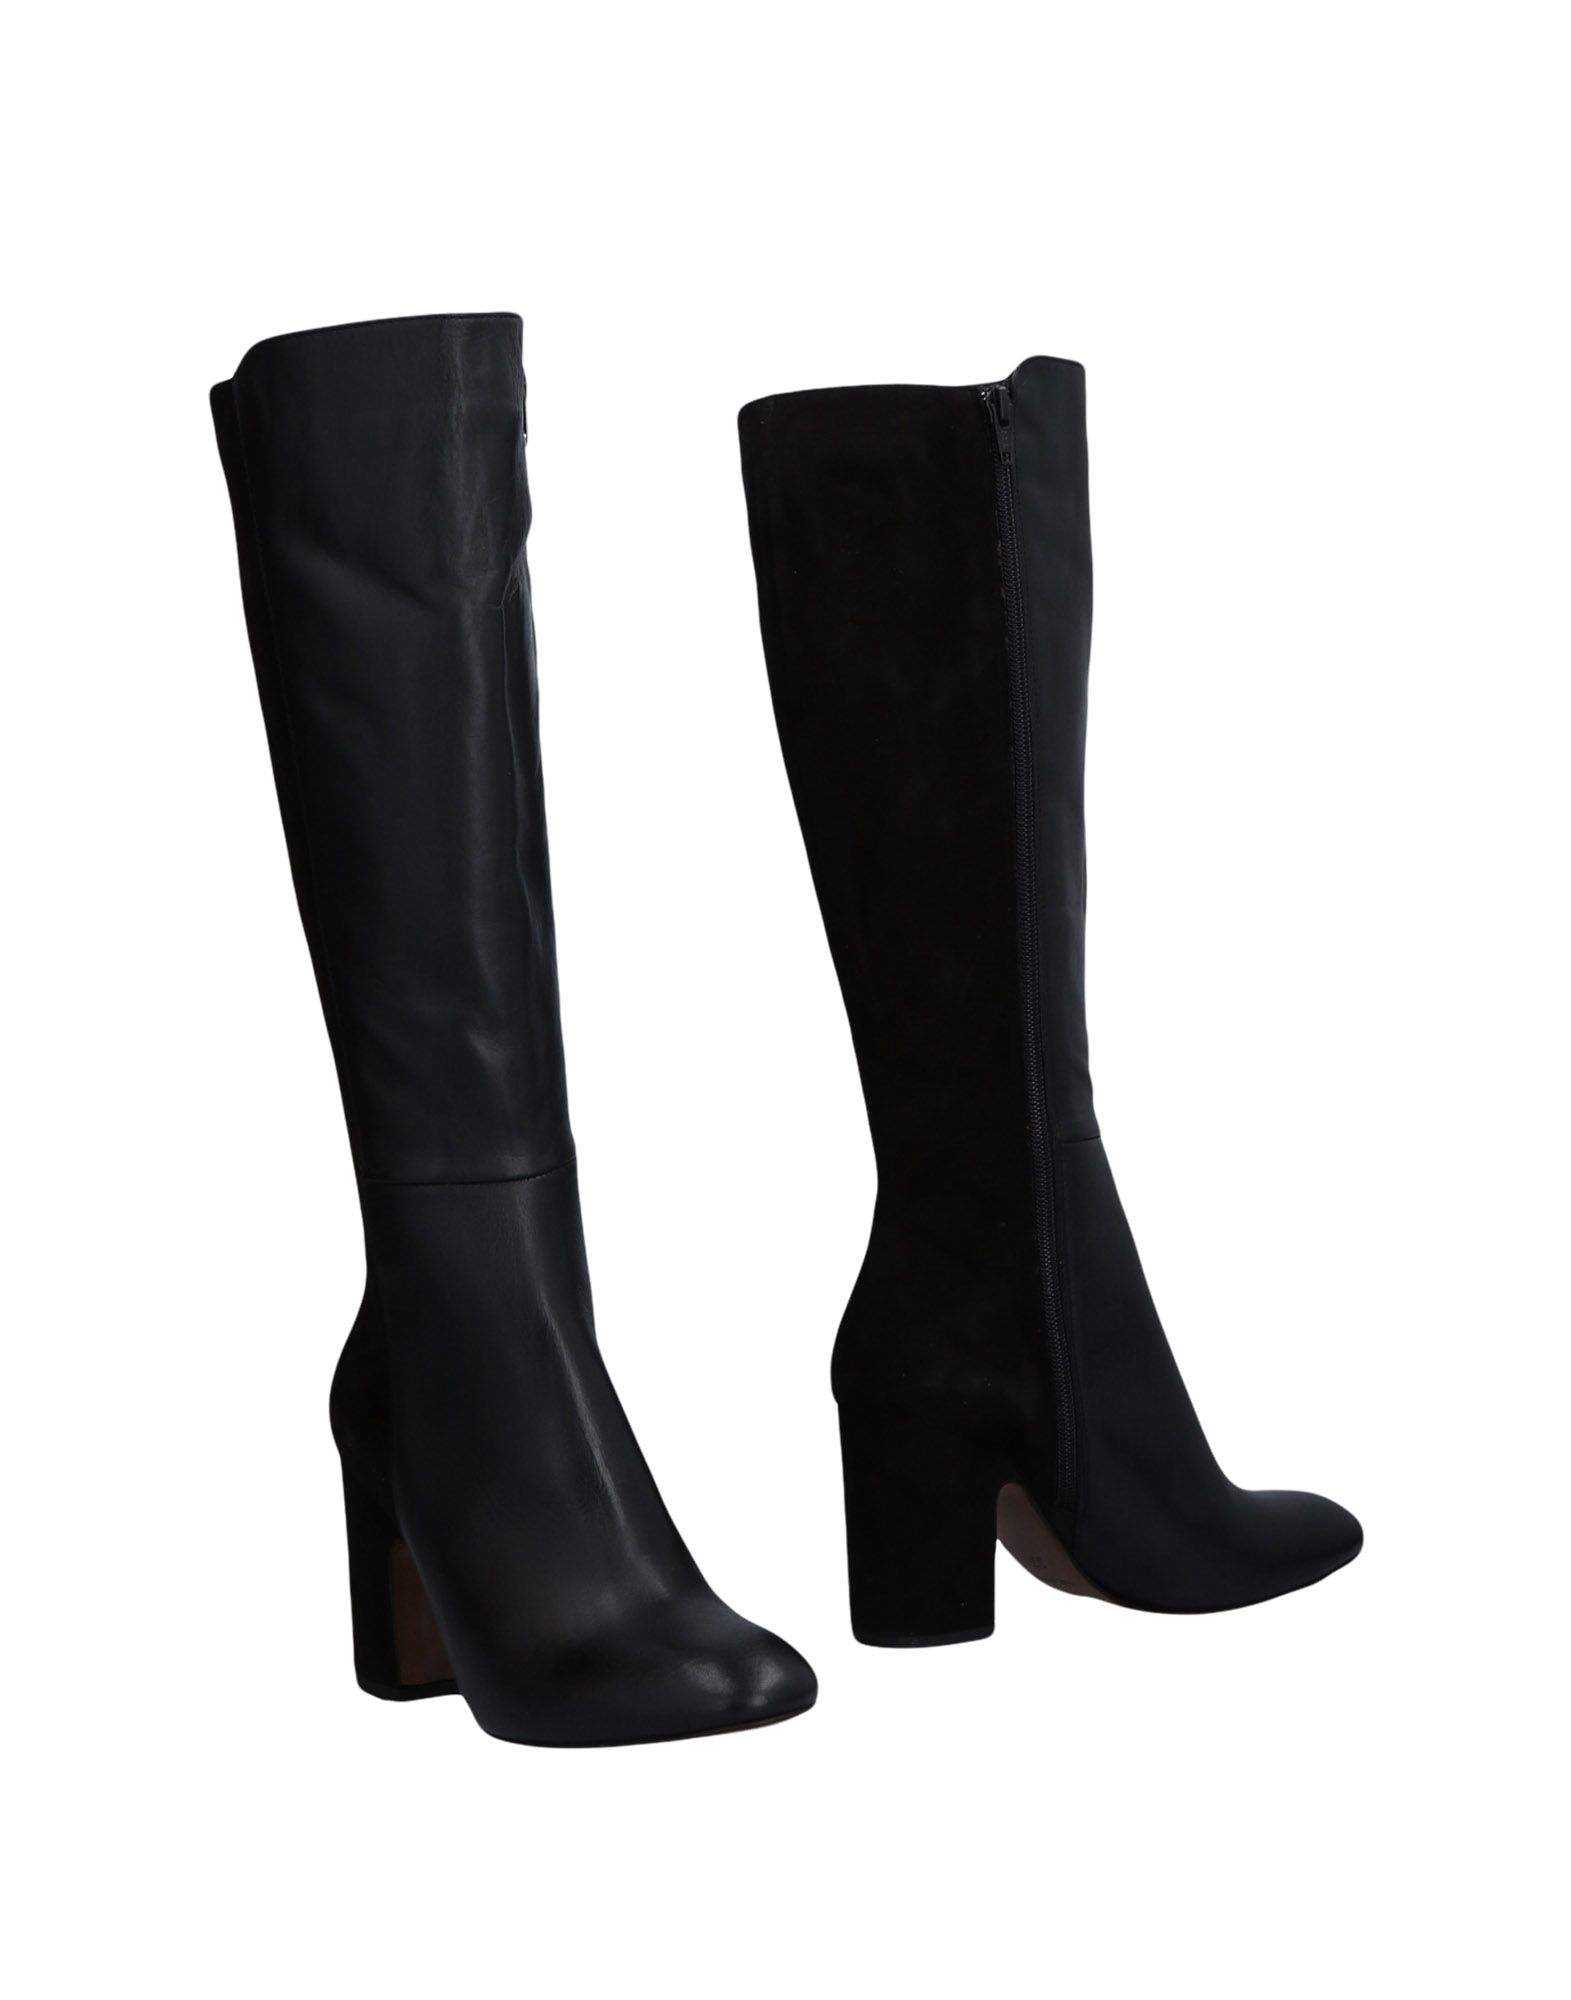 Nila & Nila & Boots - Women Nila & Nila Nila Boots online on  United Kingdom - 11478950UG e93c66